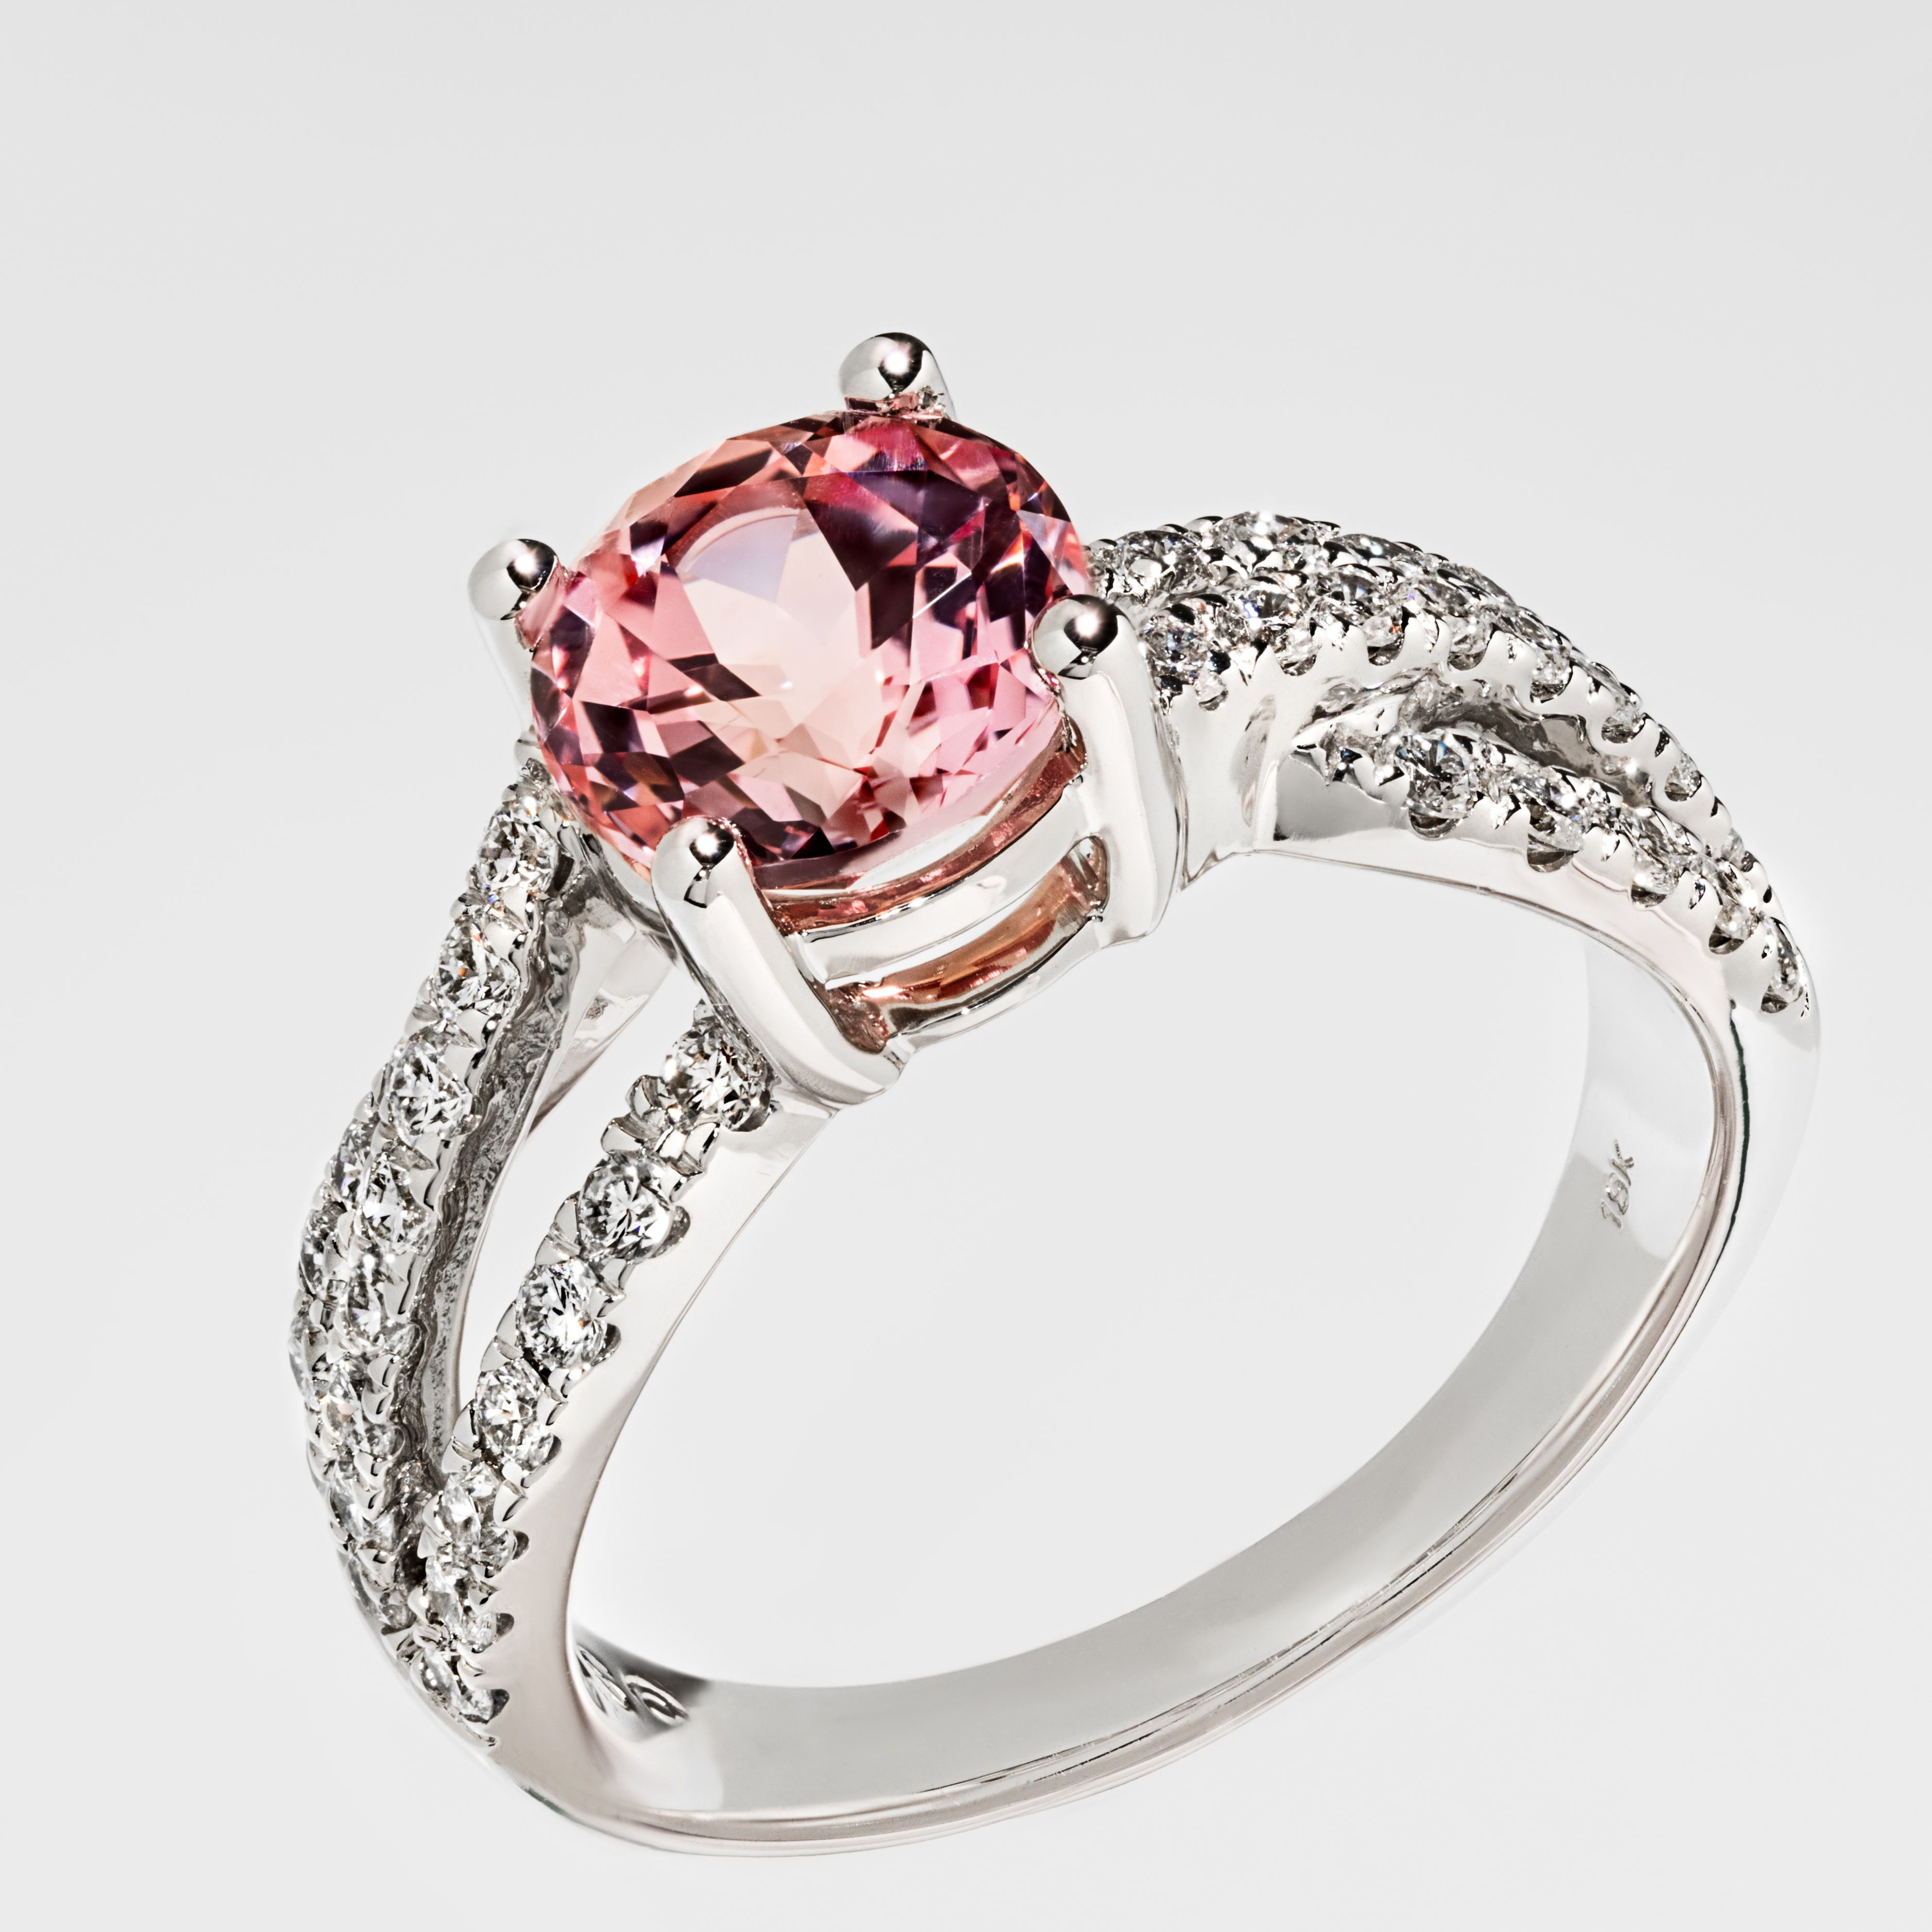 Teal Engagement Ring Teal engagement ring, Gemstone